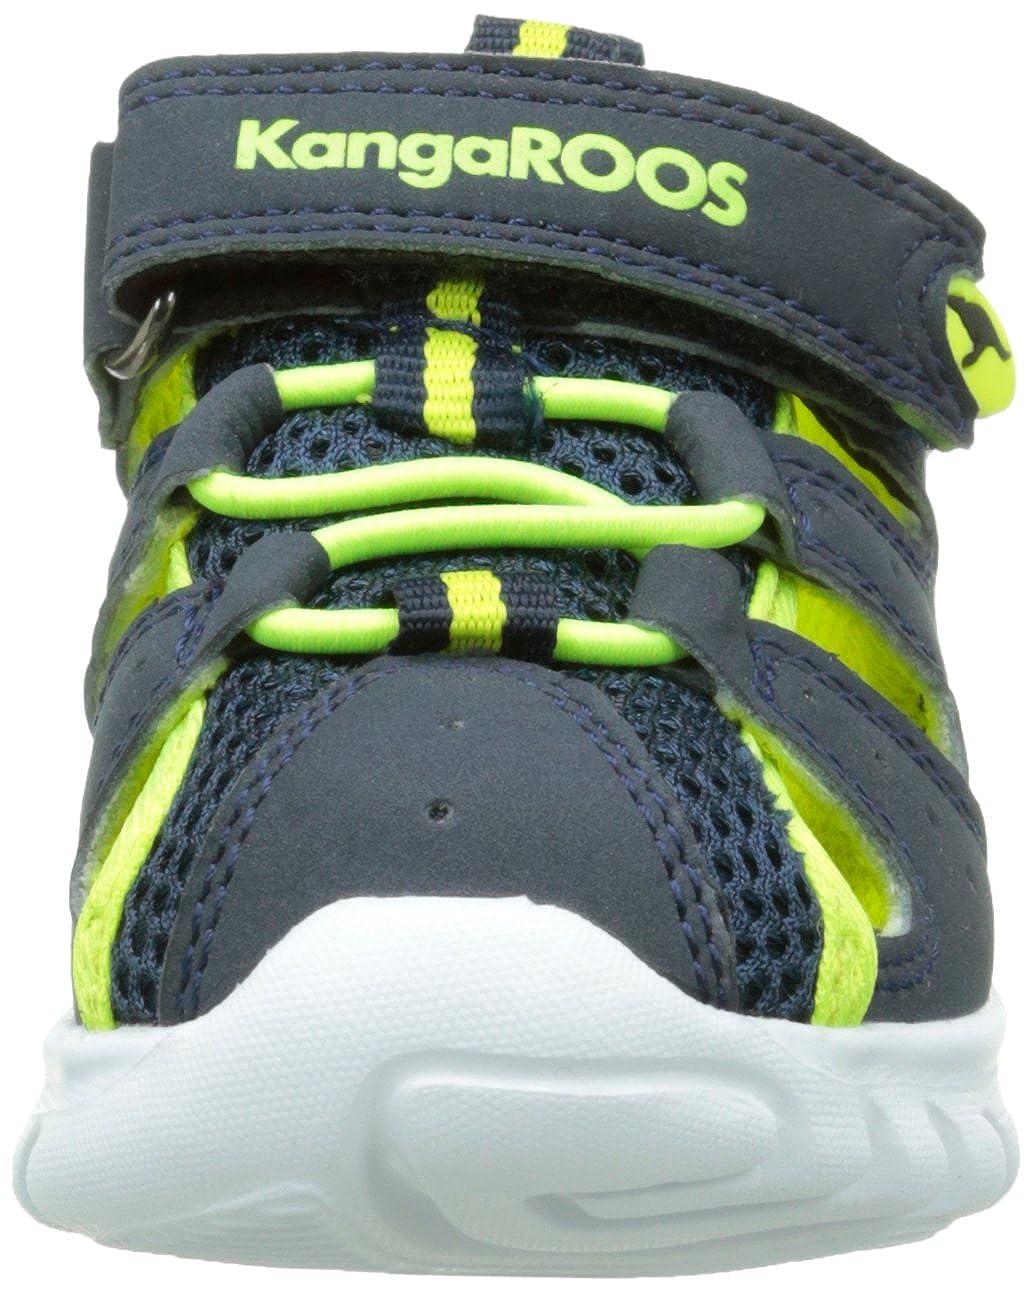 KangaROOS Baby Jungen Rock Lite Lauflernschuhe